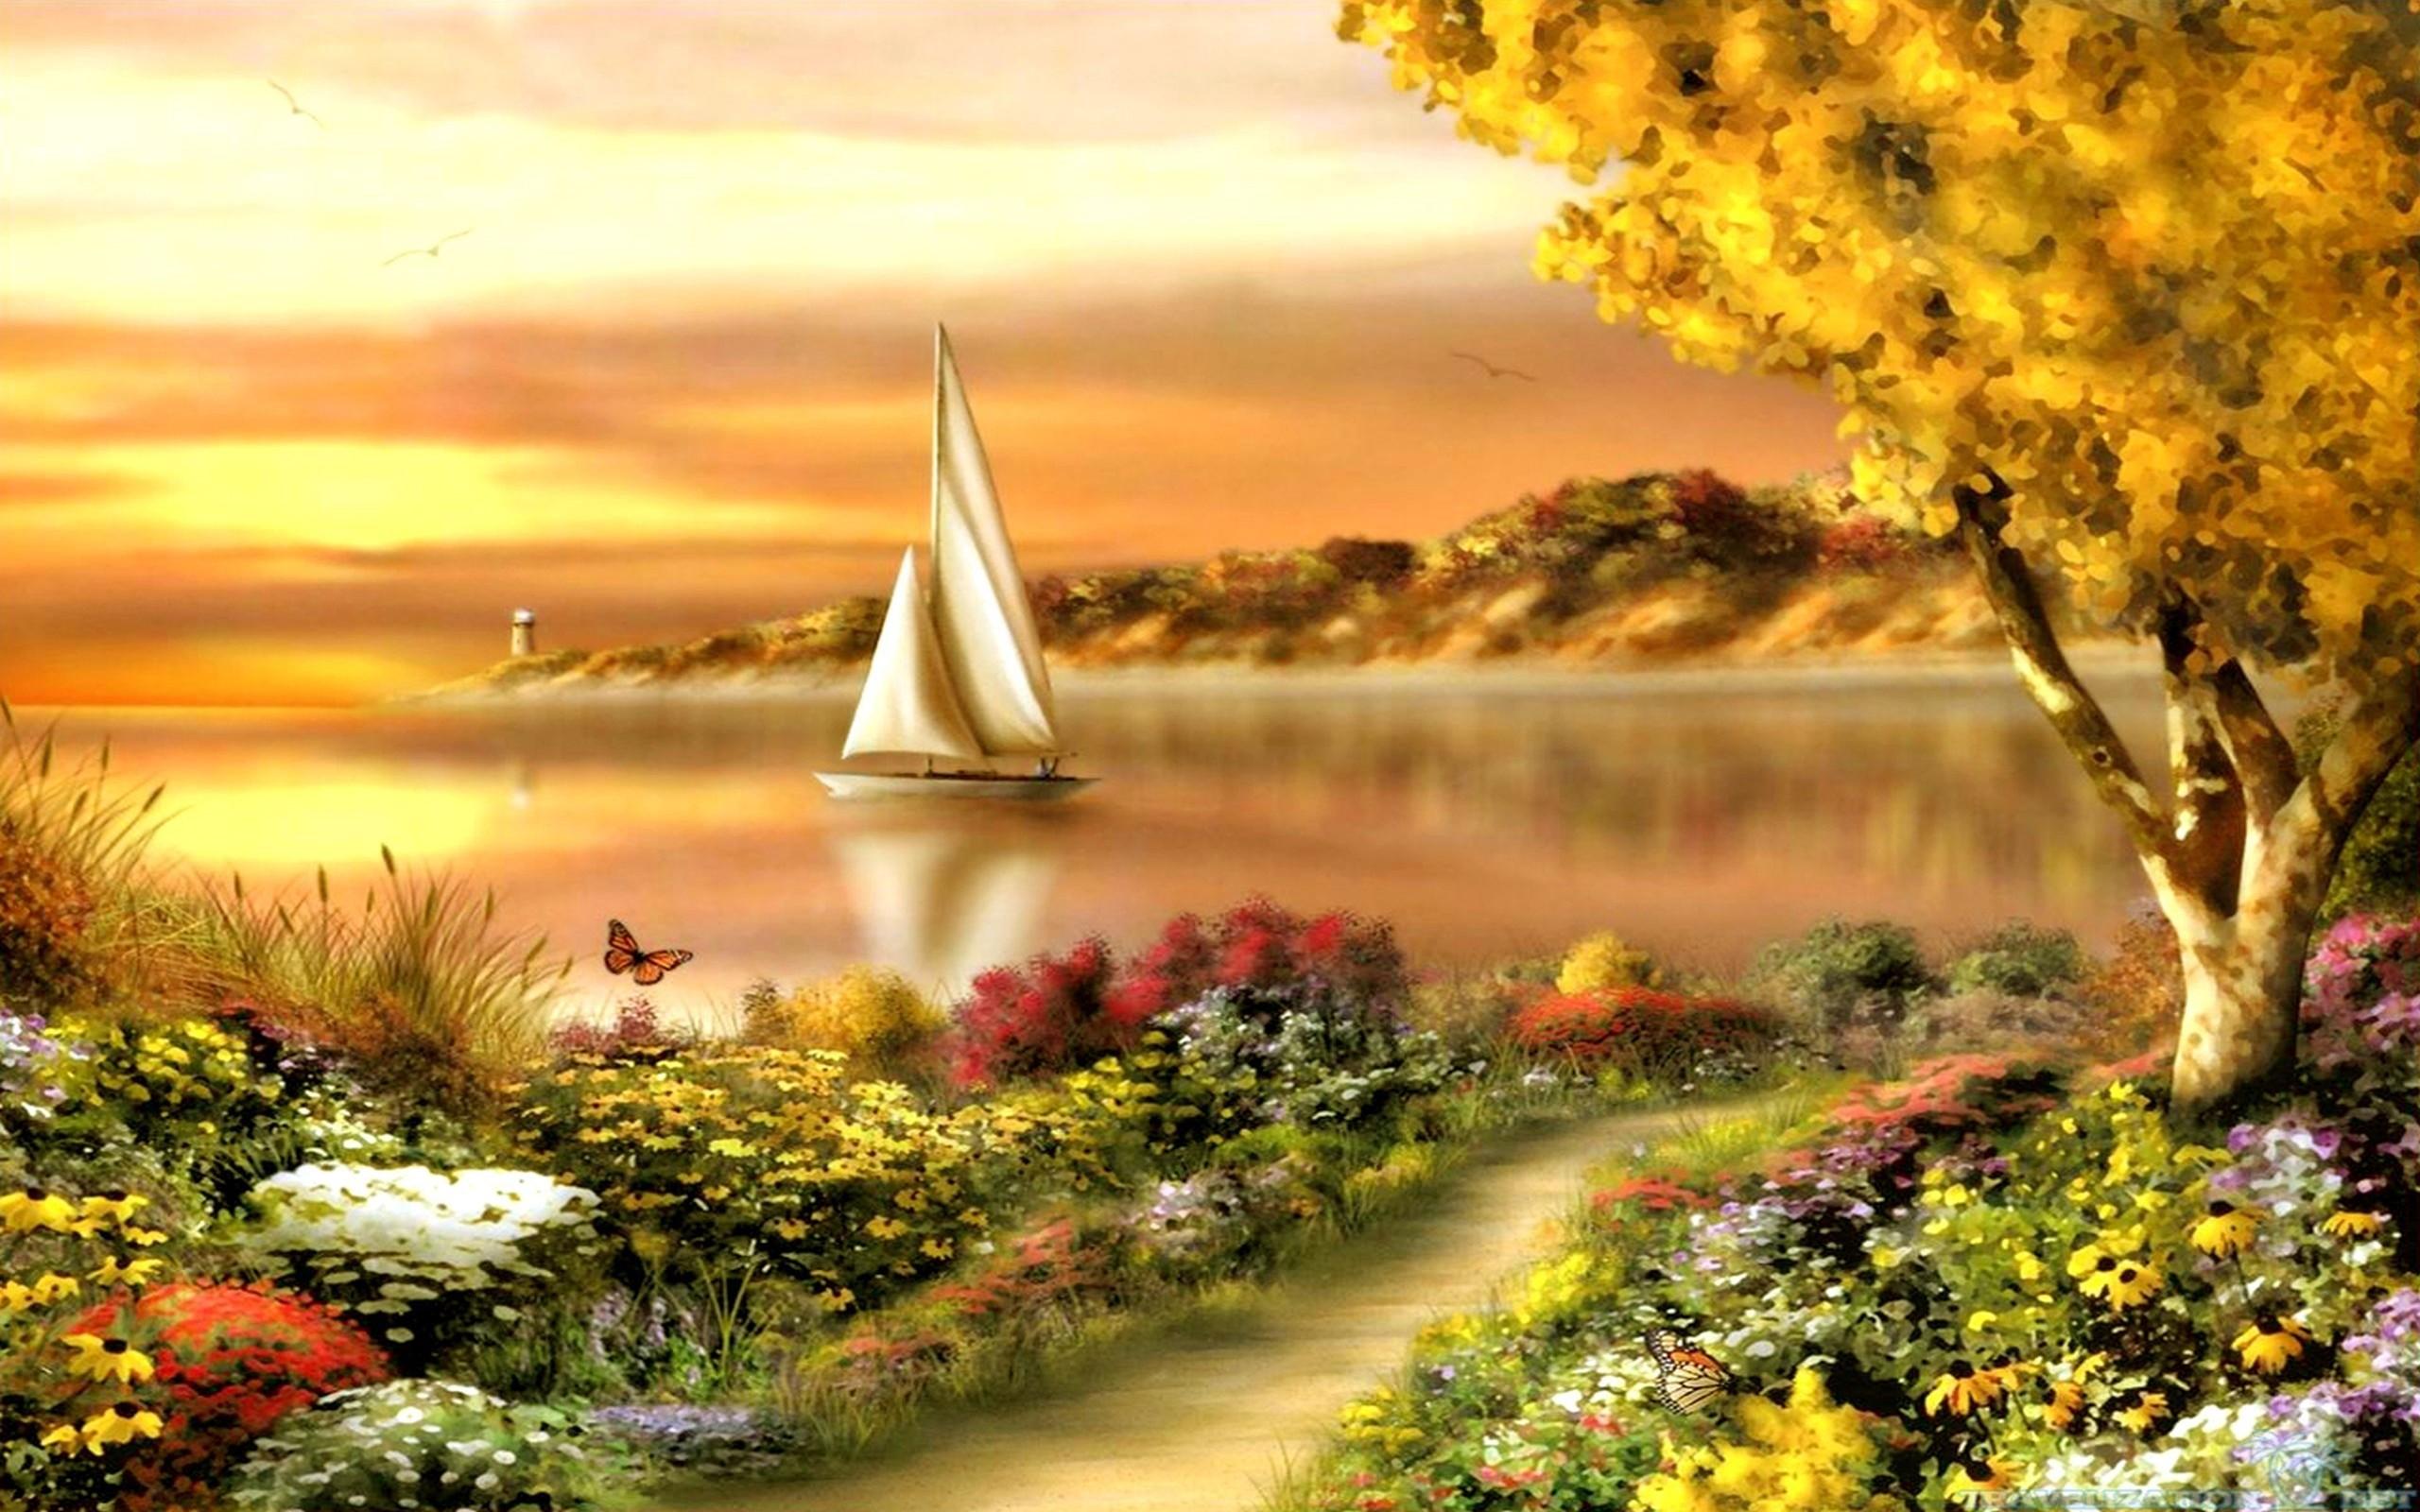 Free Beautiful Wallpapers - Wallpaper Cave  Beautiful Summer Scenes